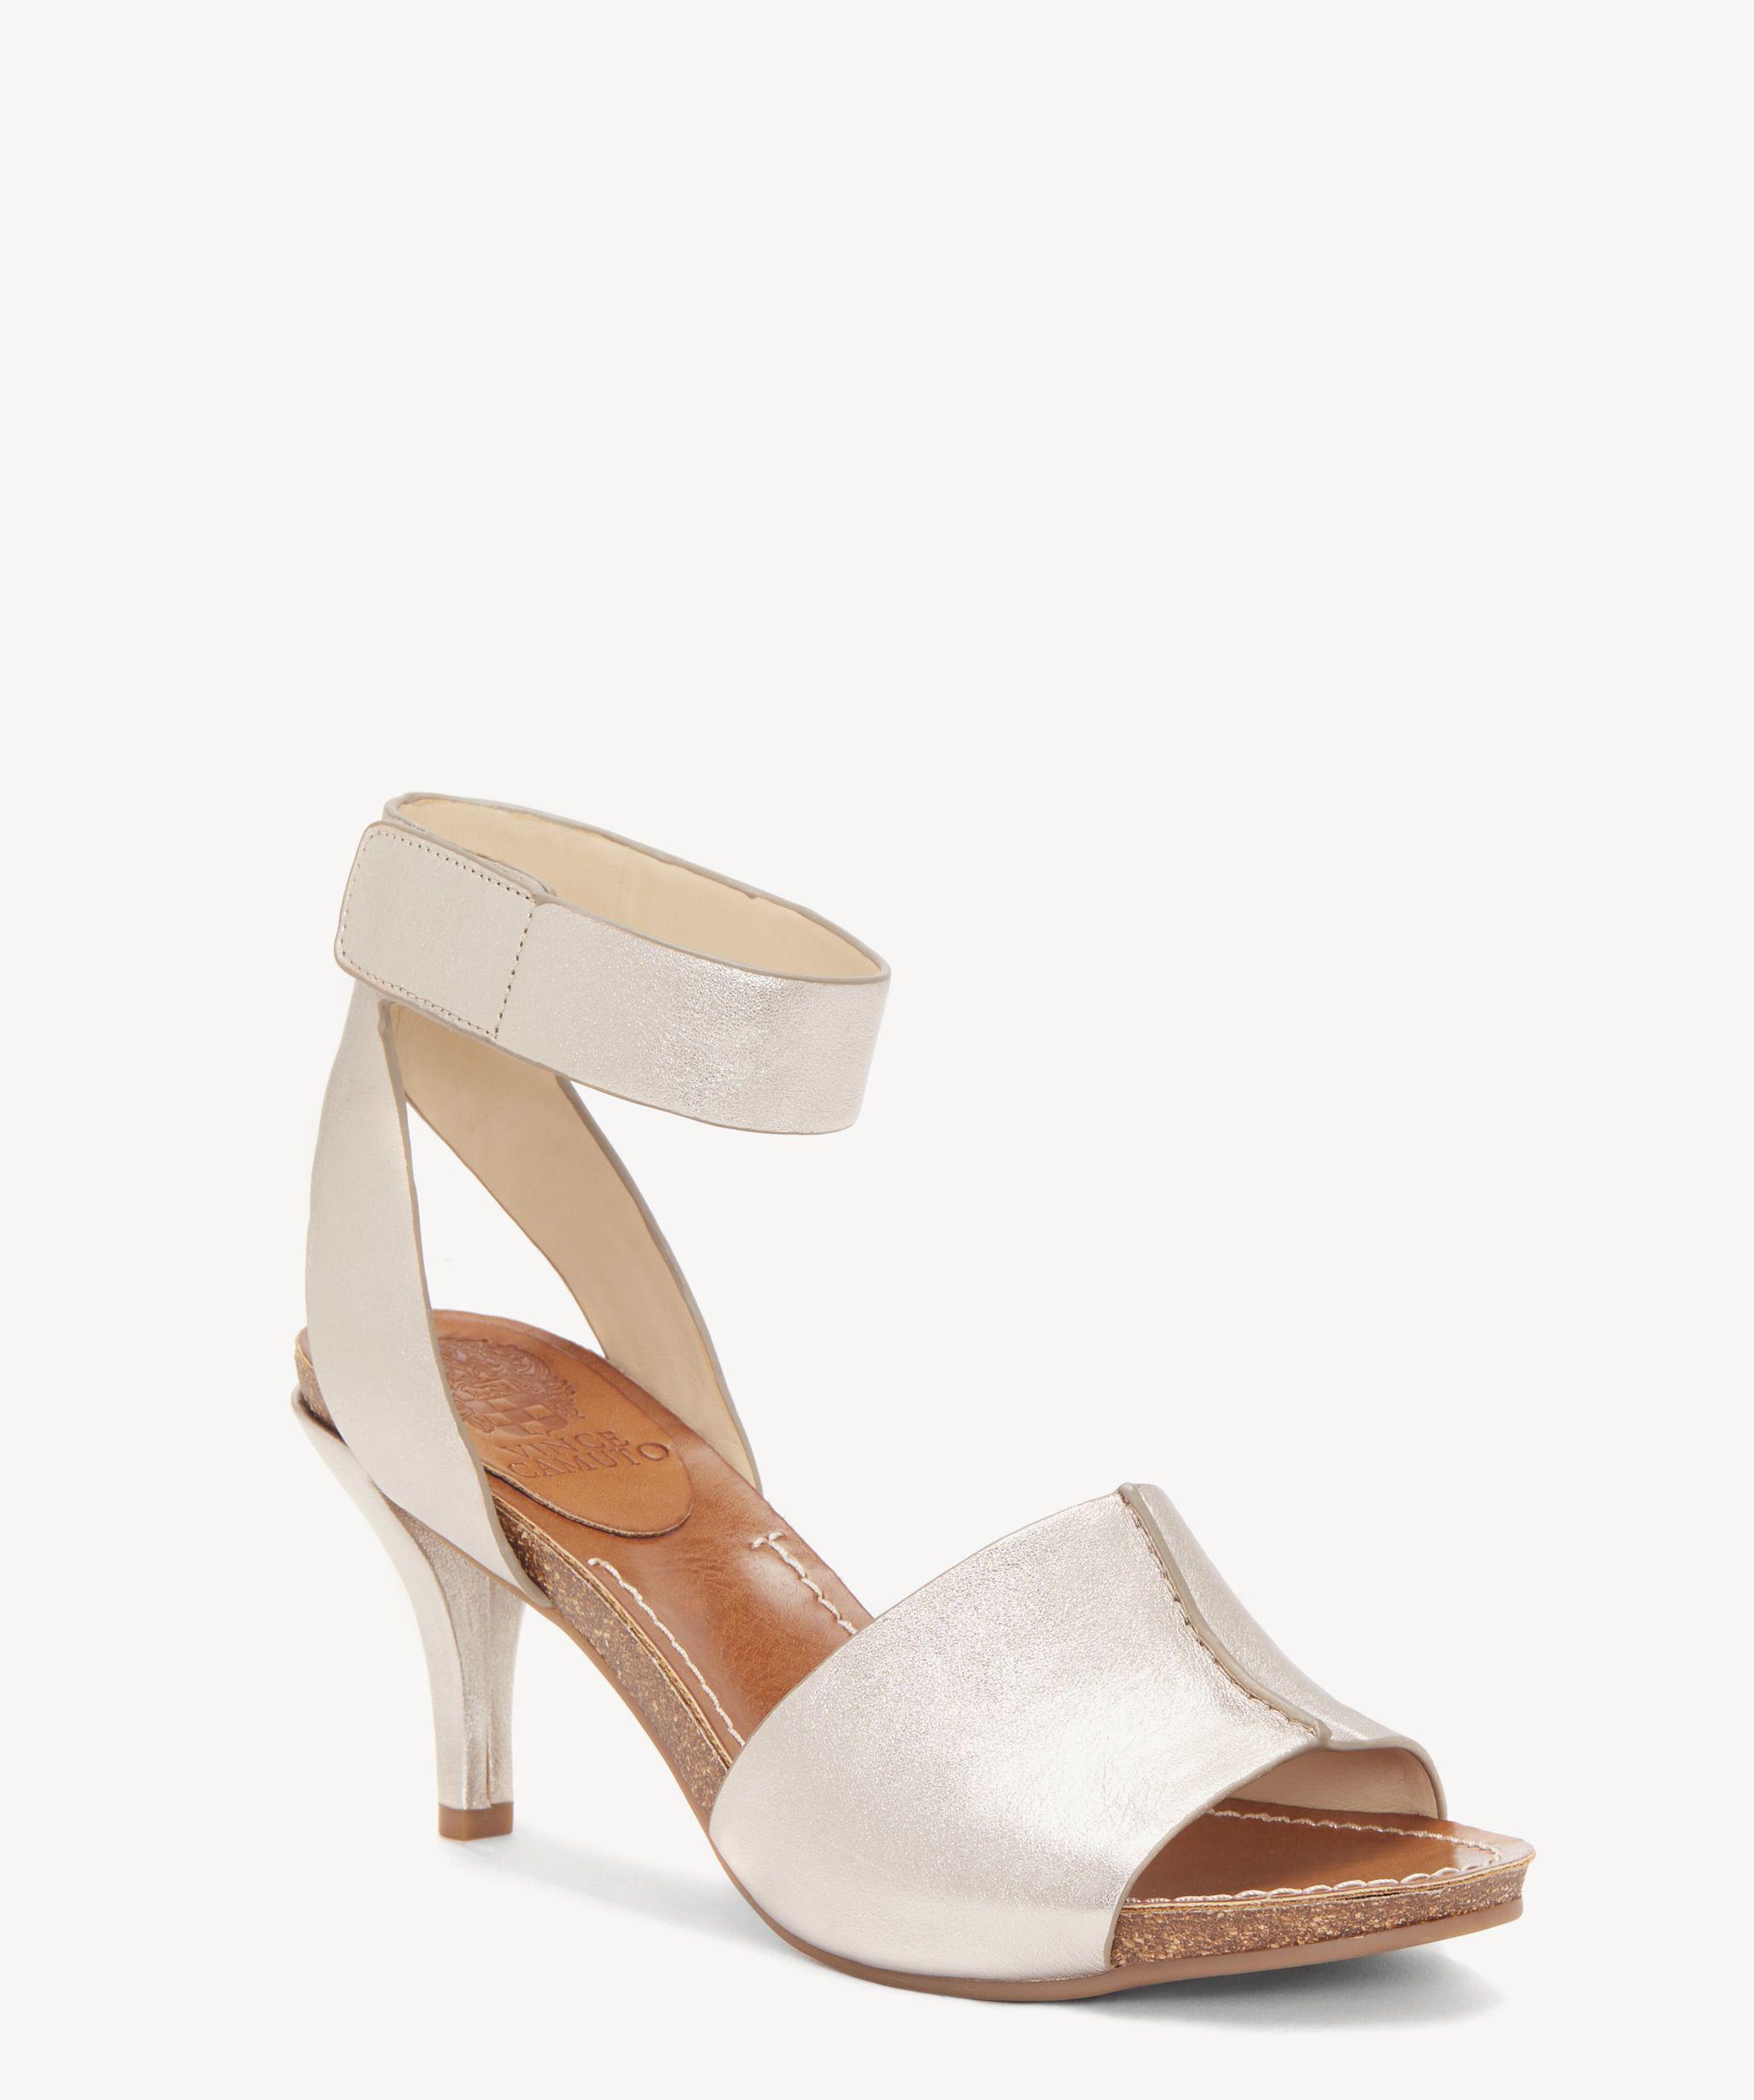 4a795b0dfb1 Vince Camuto. Women s Odela Heeled Sandal